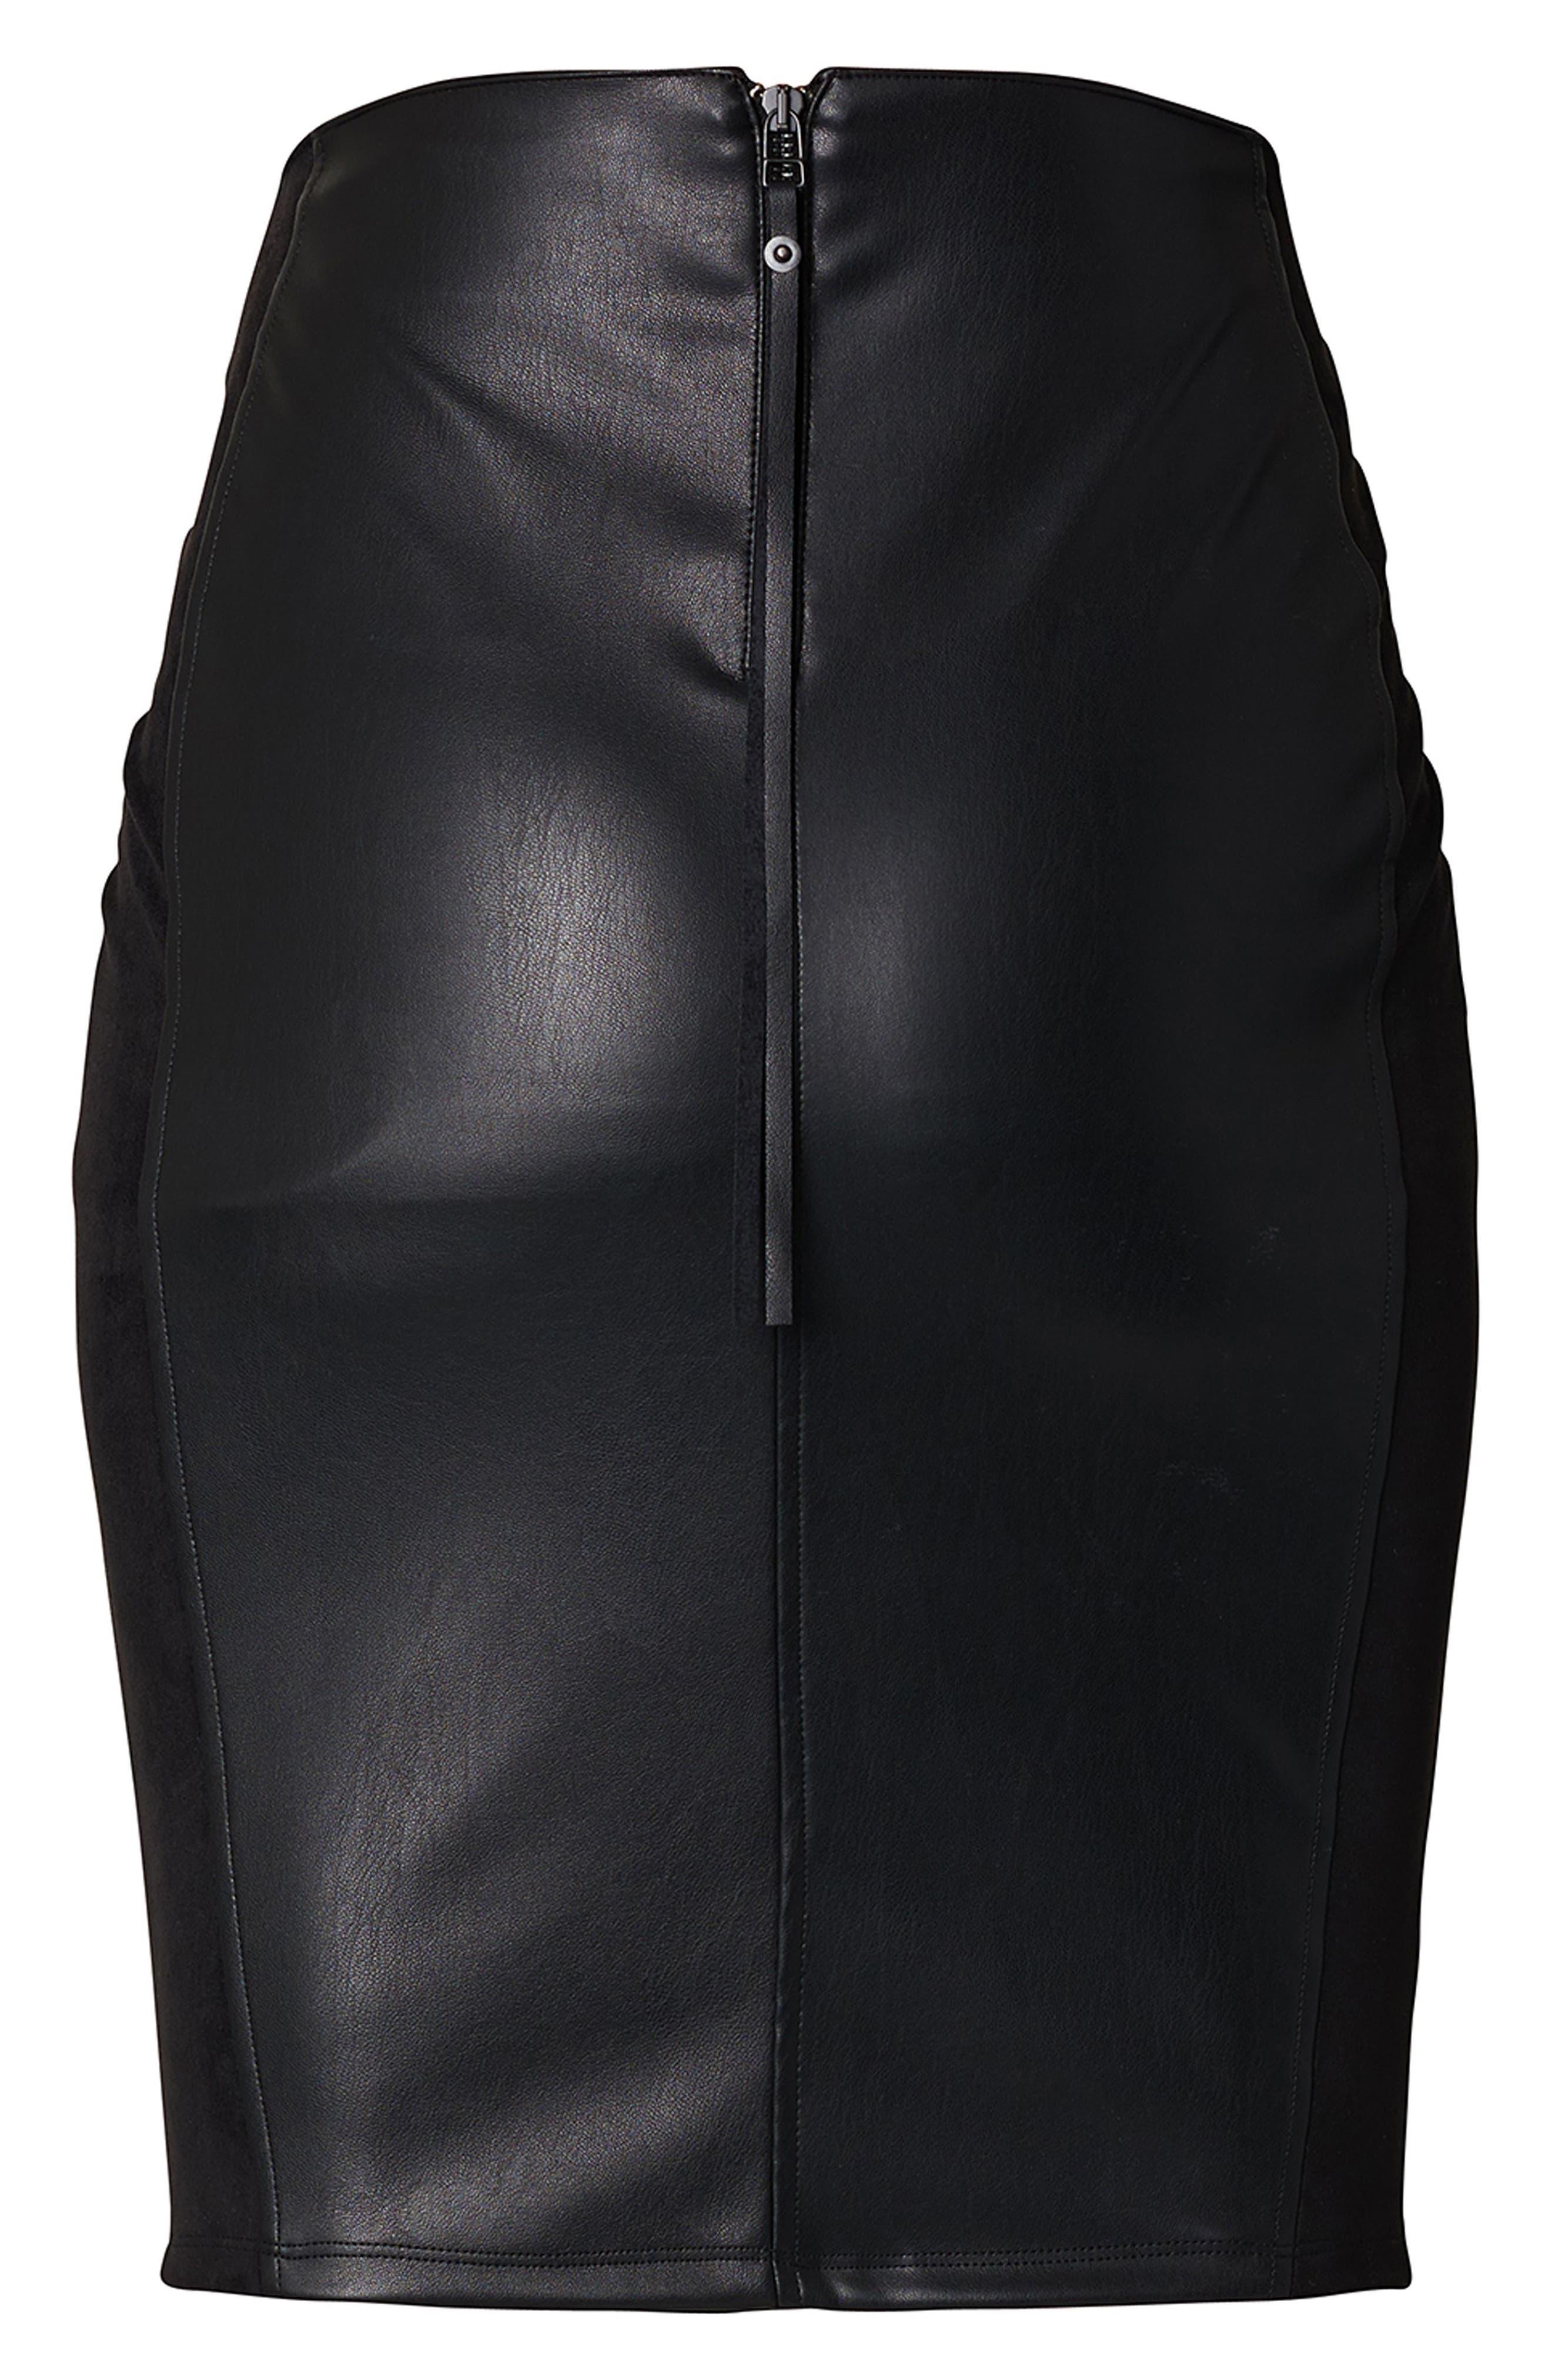 SUPERMOM High Waist Faux Leather Skirt, Main, color, 001